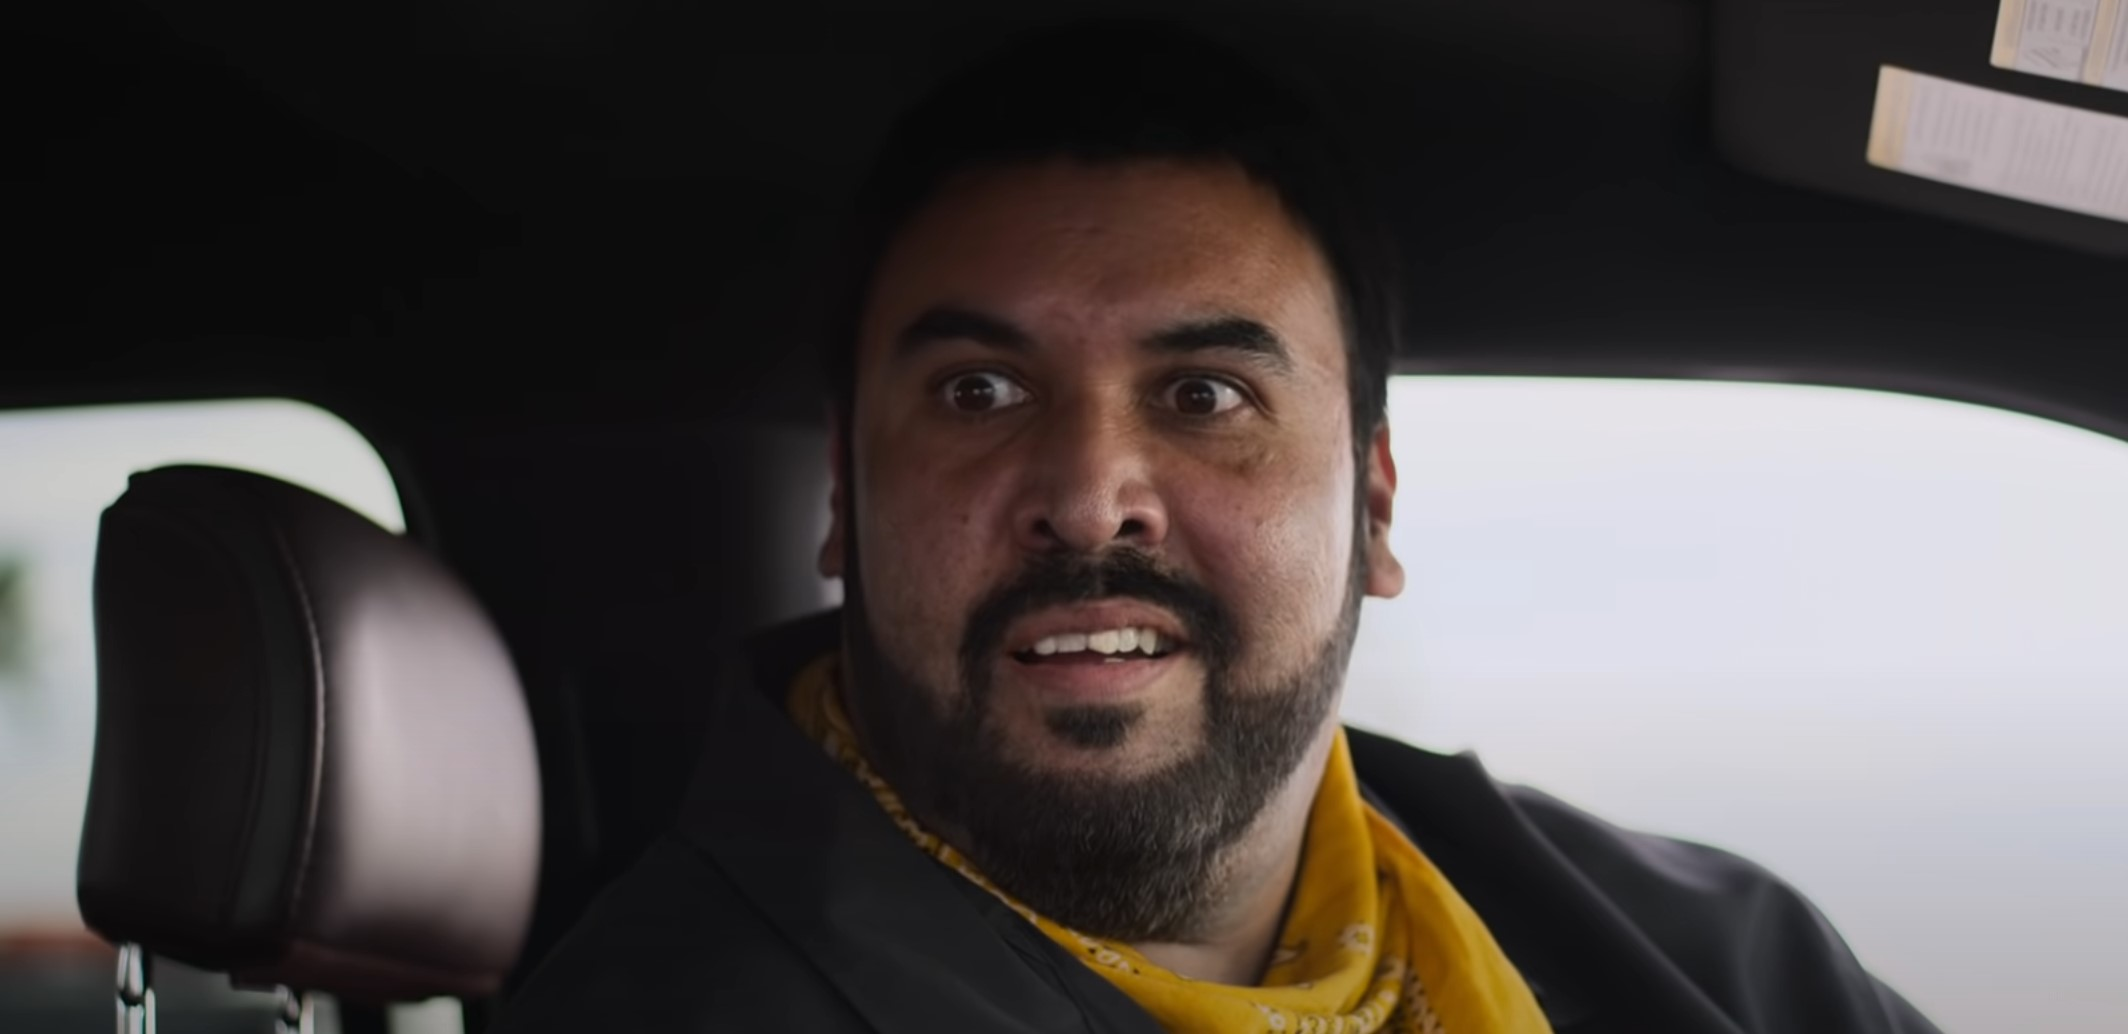 Heist: True Crime Documentary Series on Netflix | Will there be Heist Season 2? Release Date